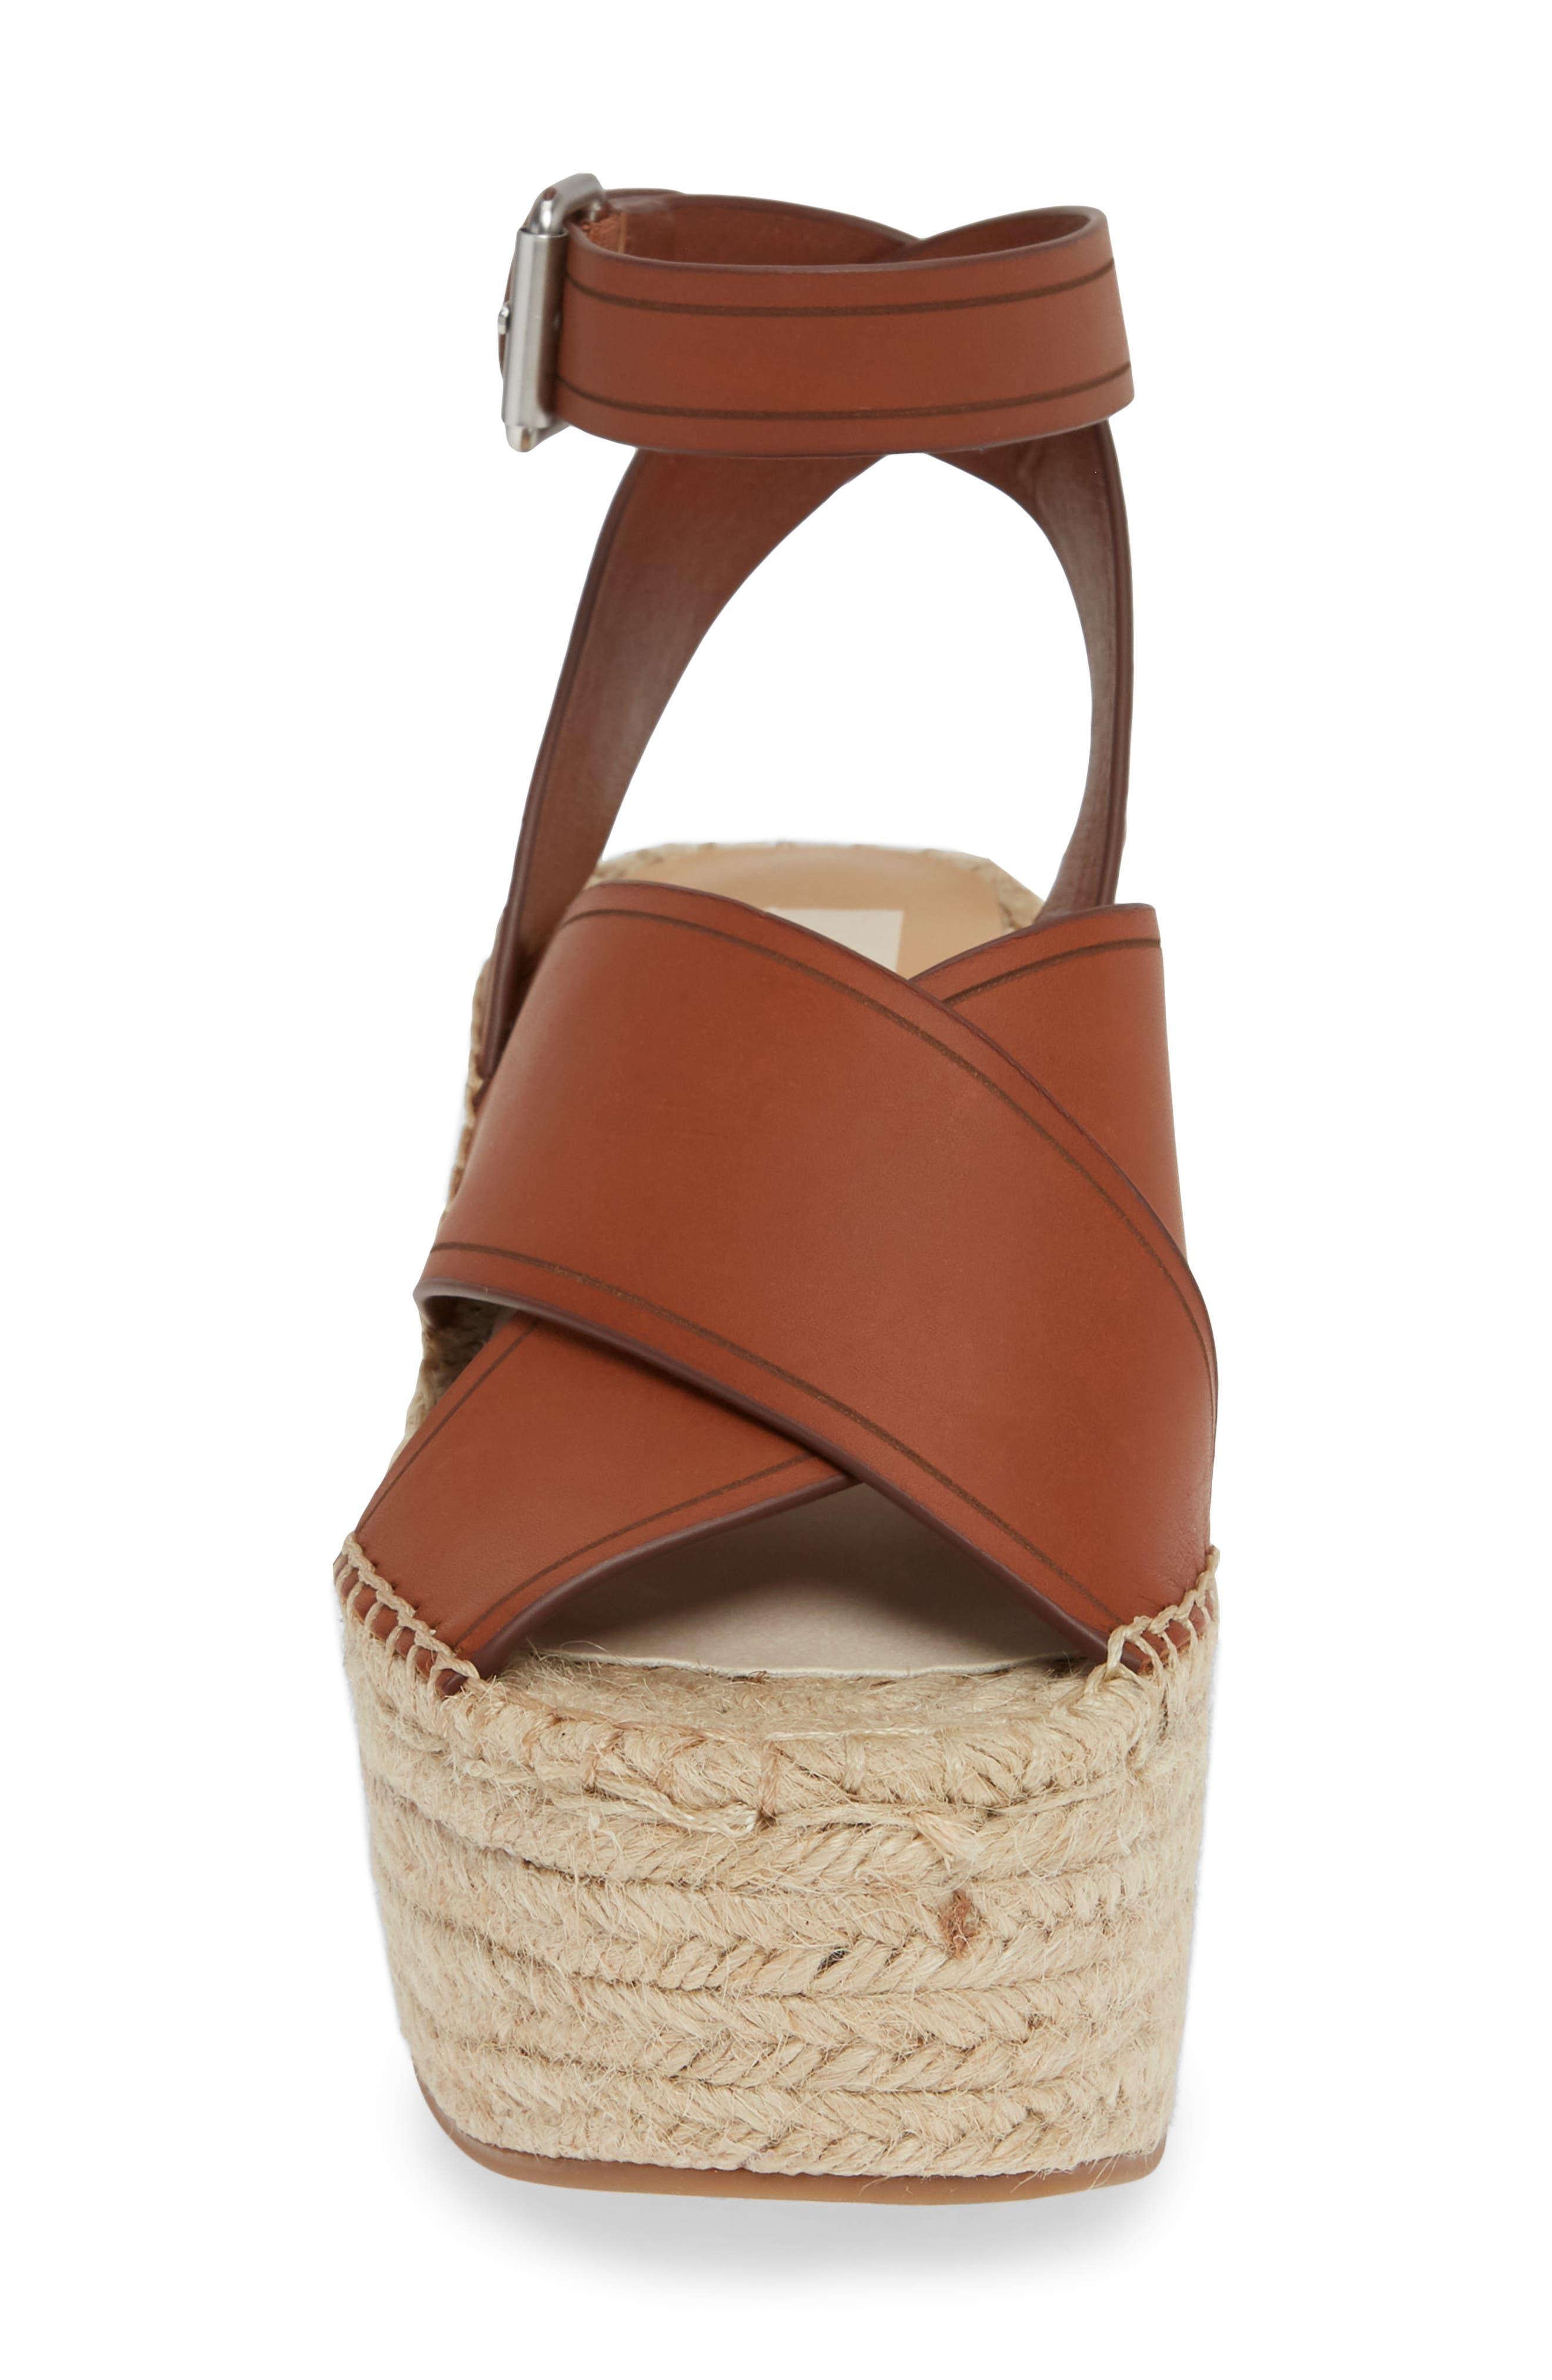 DOLCE VITA, Carsie Platform Sandal, Alternate thumbnail 4, color, BROWN LEATHER